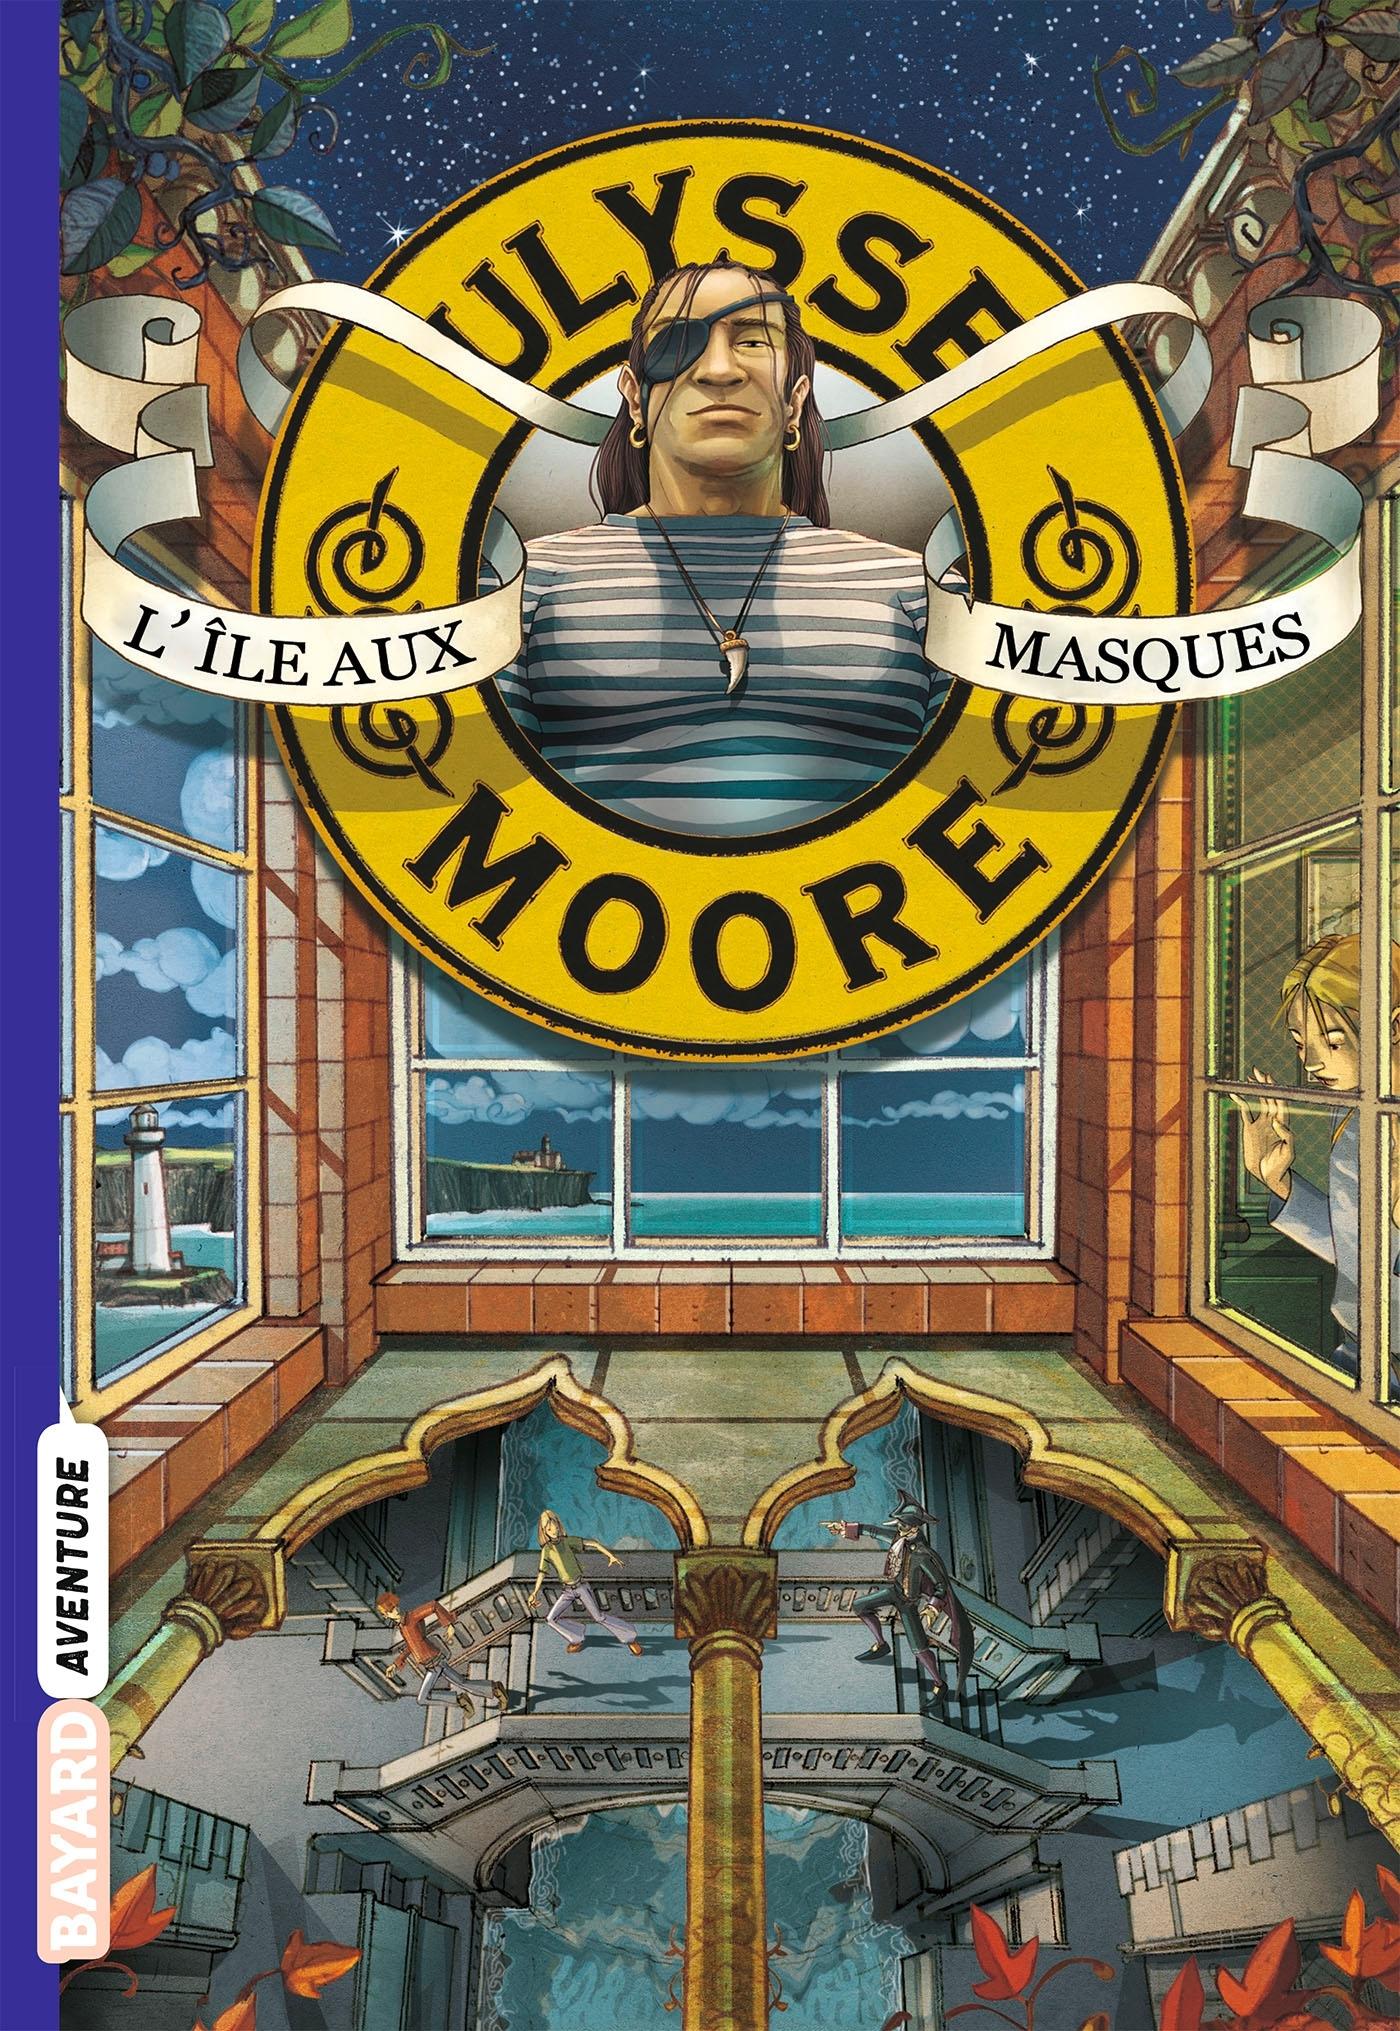 ULYSSE MOORE, TOME 04 - L'ILE AUX MASQUES